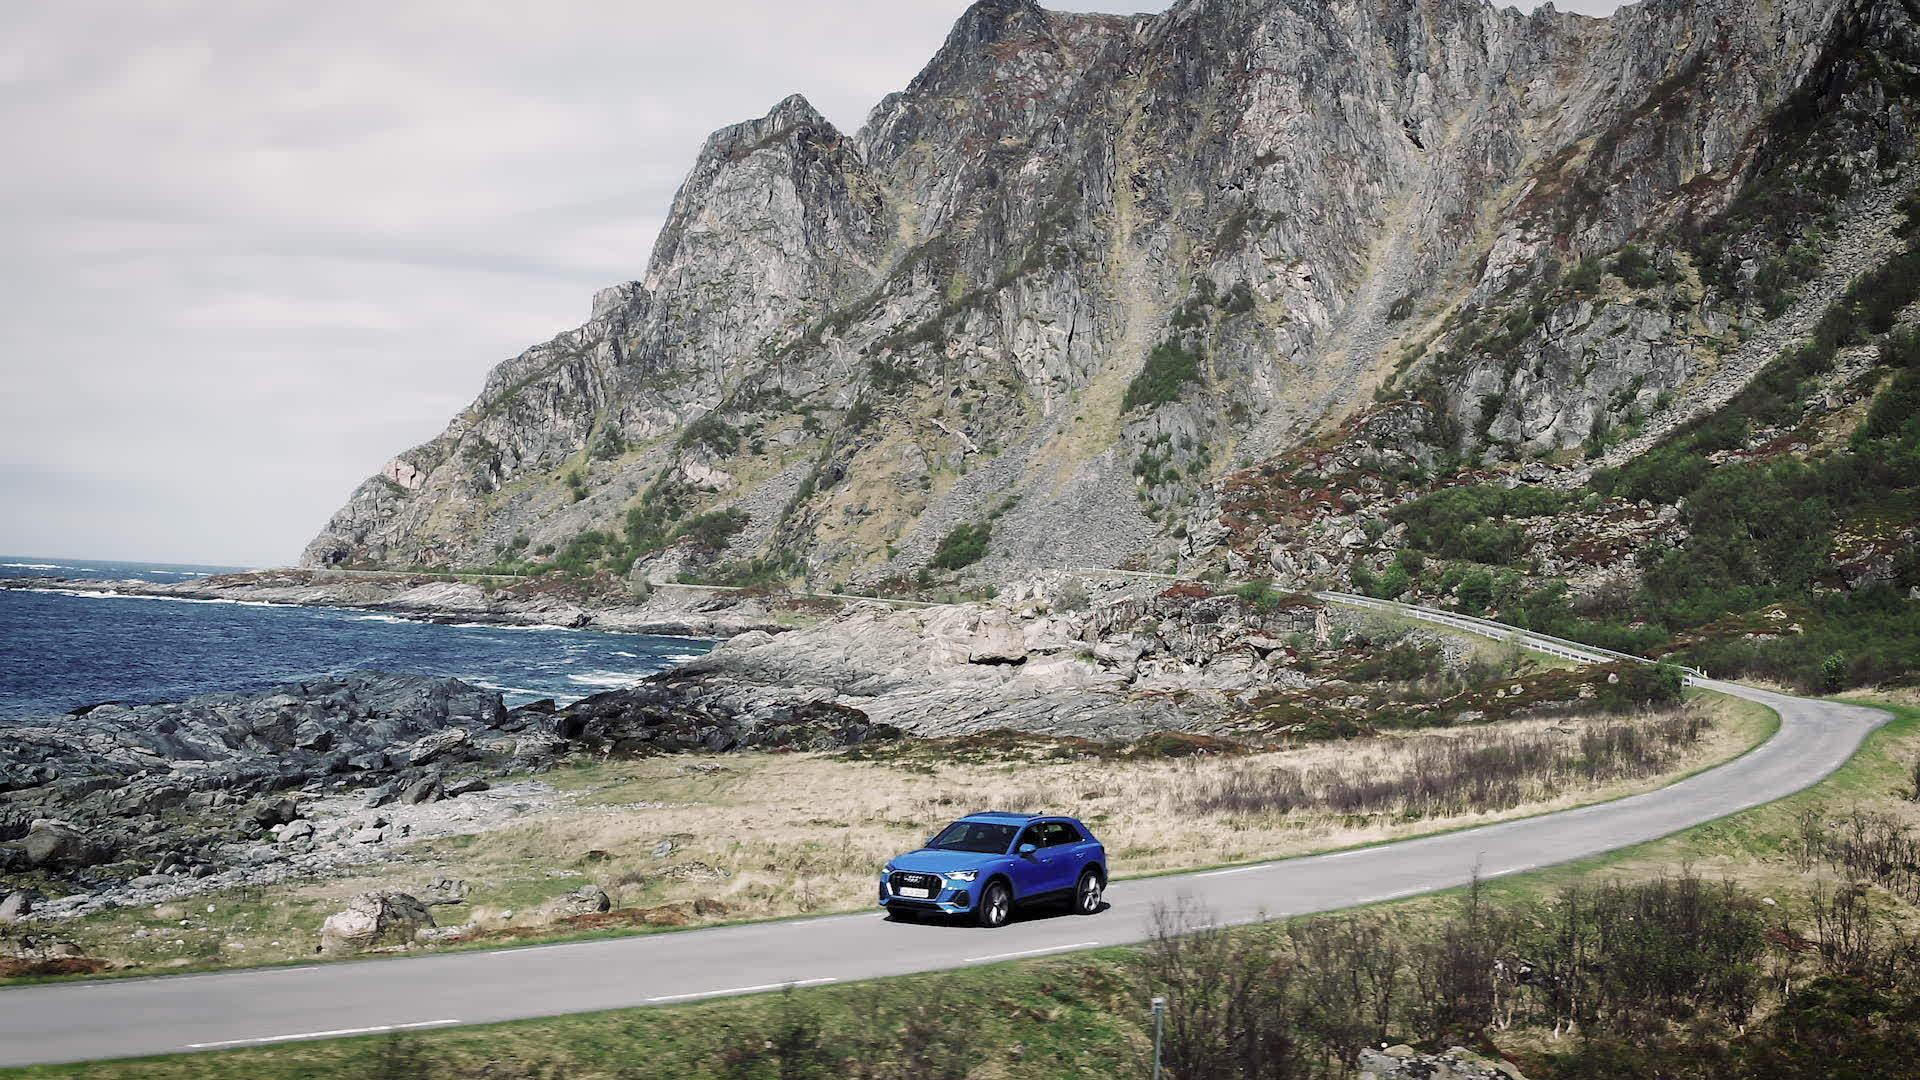 Trailer: The new Audi Q3